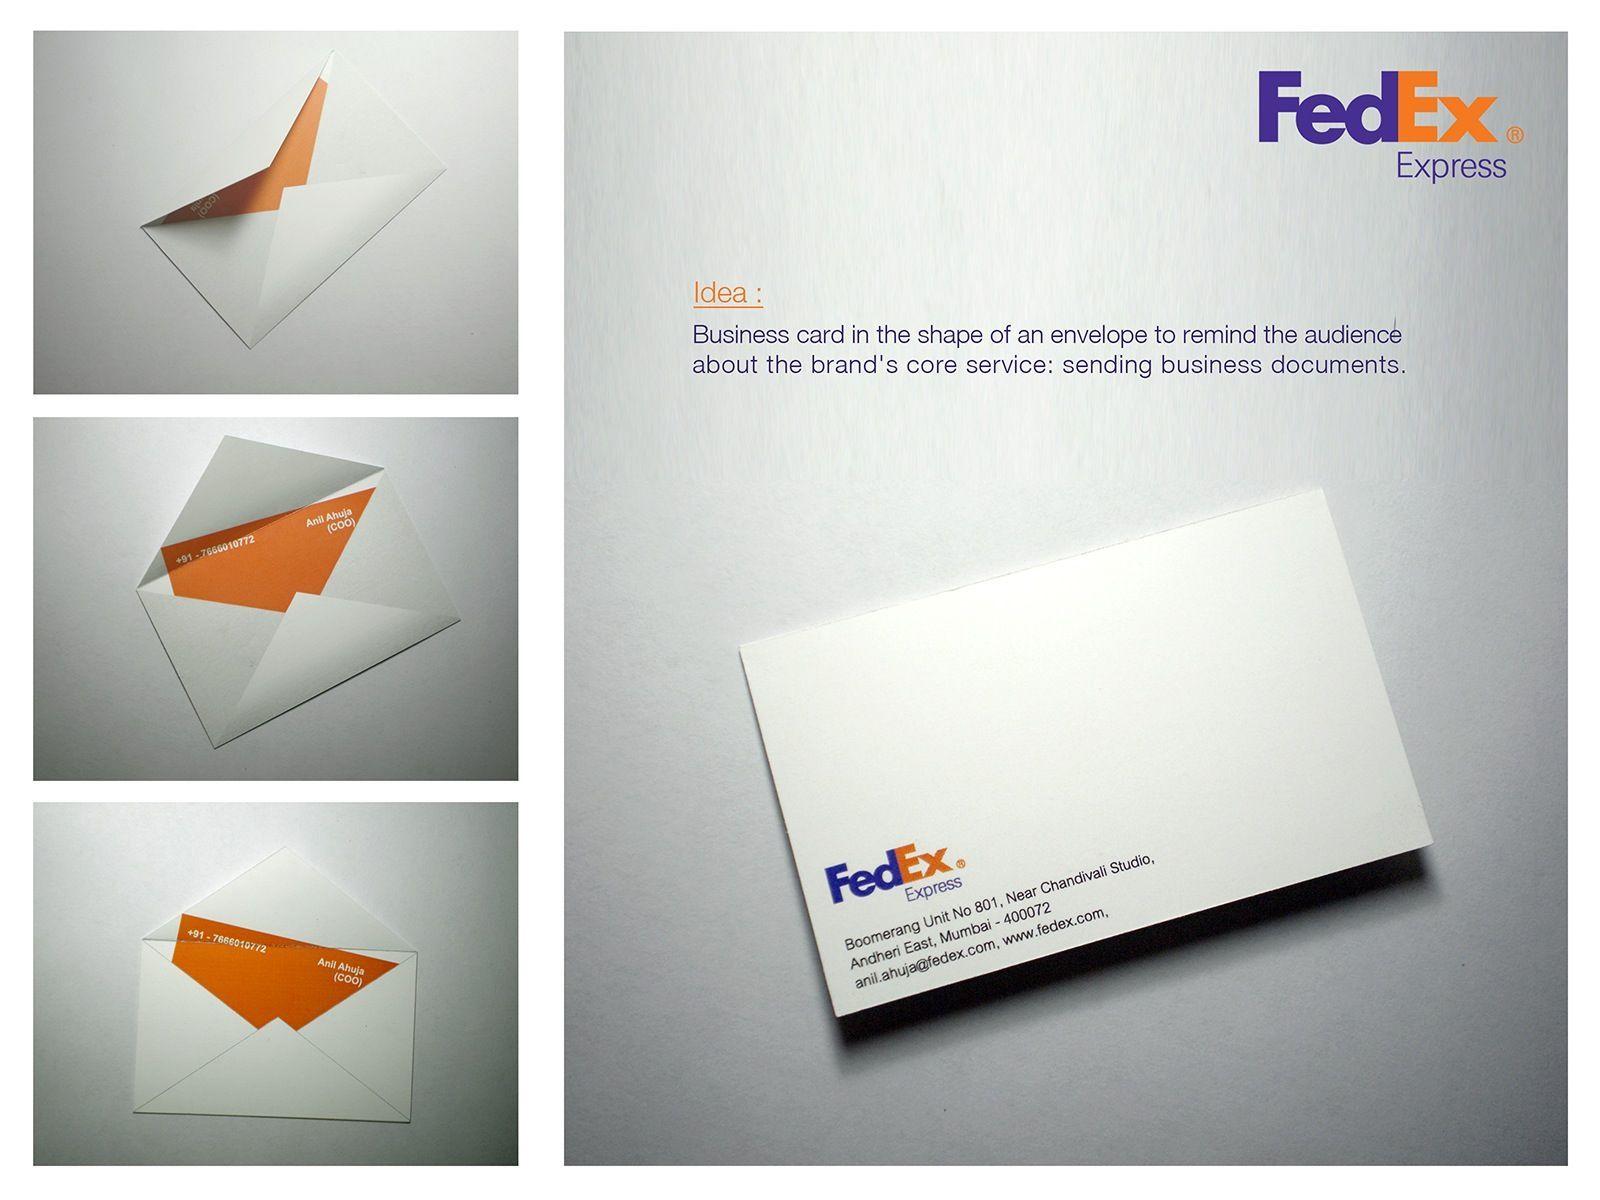 Fedex Envelope Business Card Design Unique Business With Fedex Brochure Template Business Cards Creative Business Card Design Creative Business Card Design